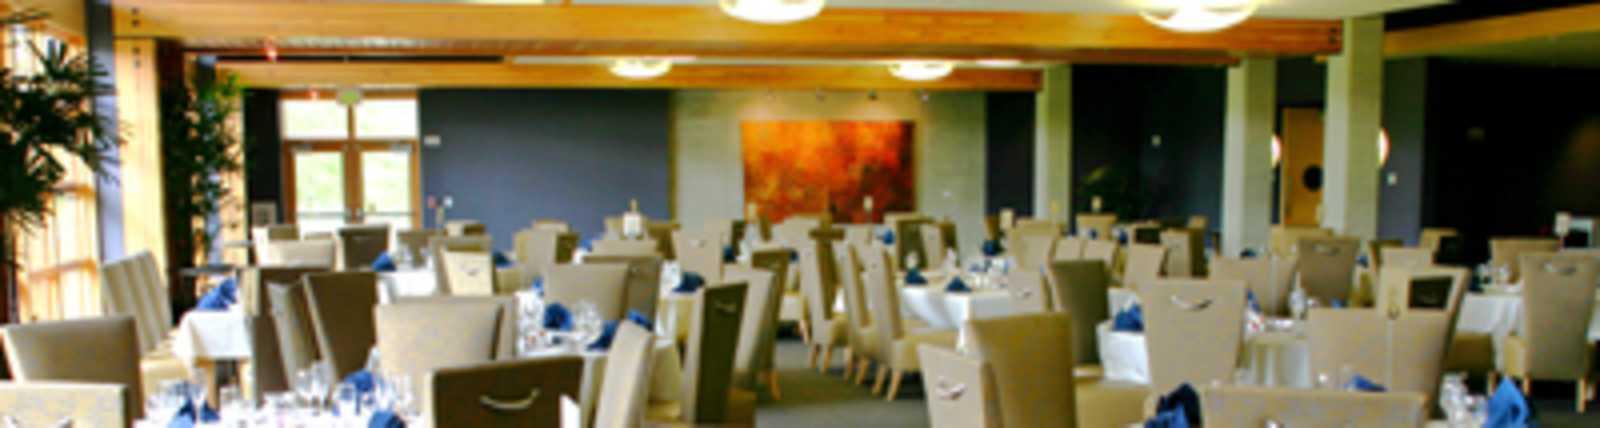 meeting-facility-Cedarbrook_Lodge_Meeting_Facility-3.jpg